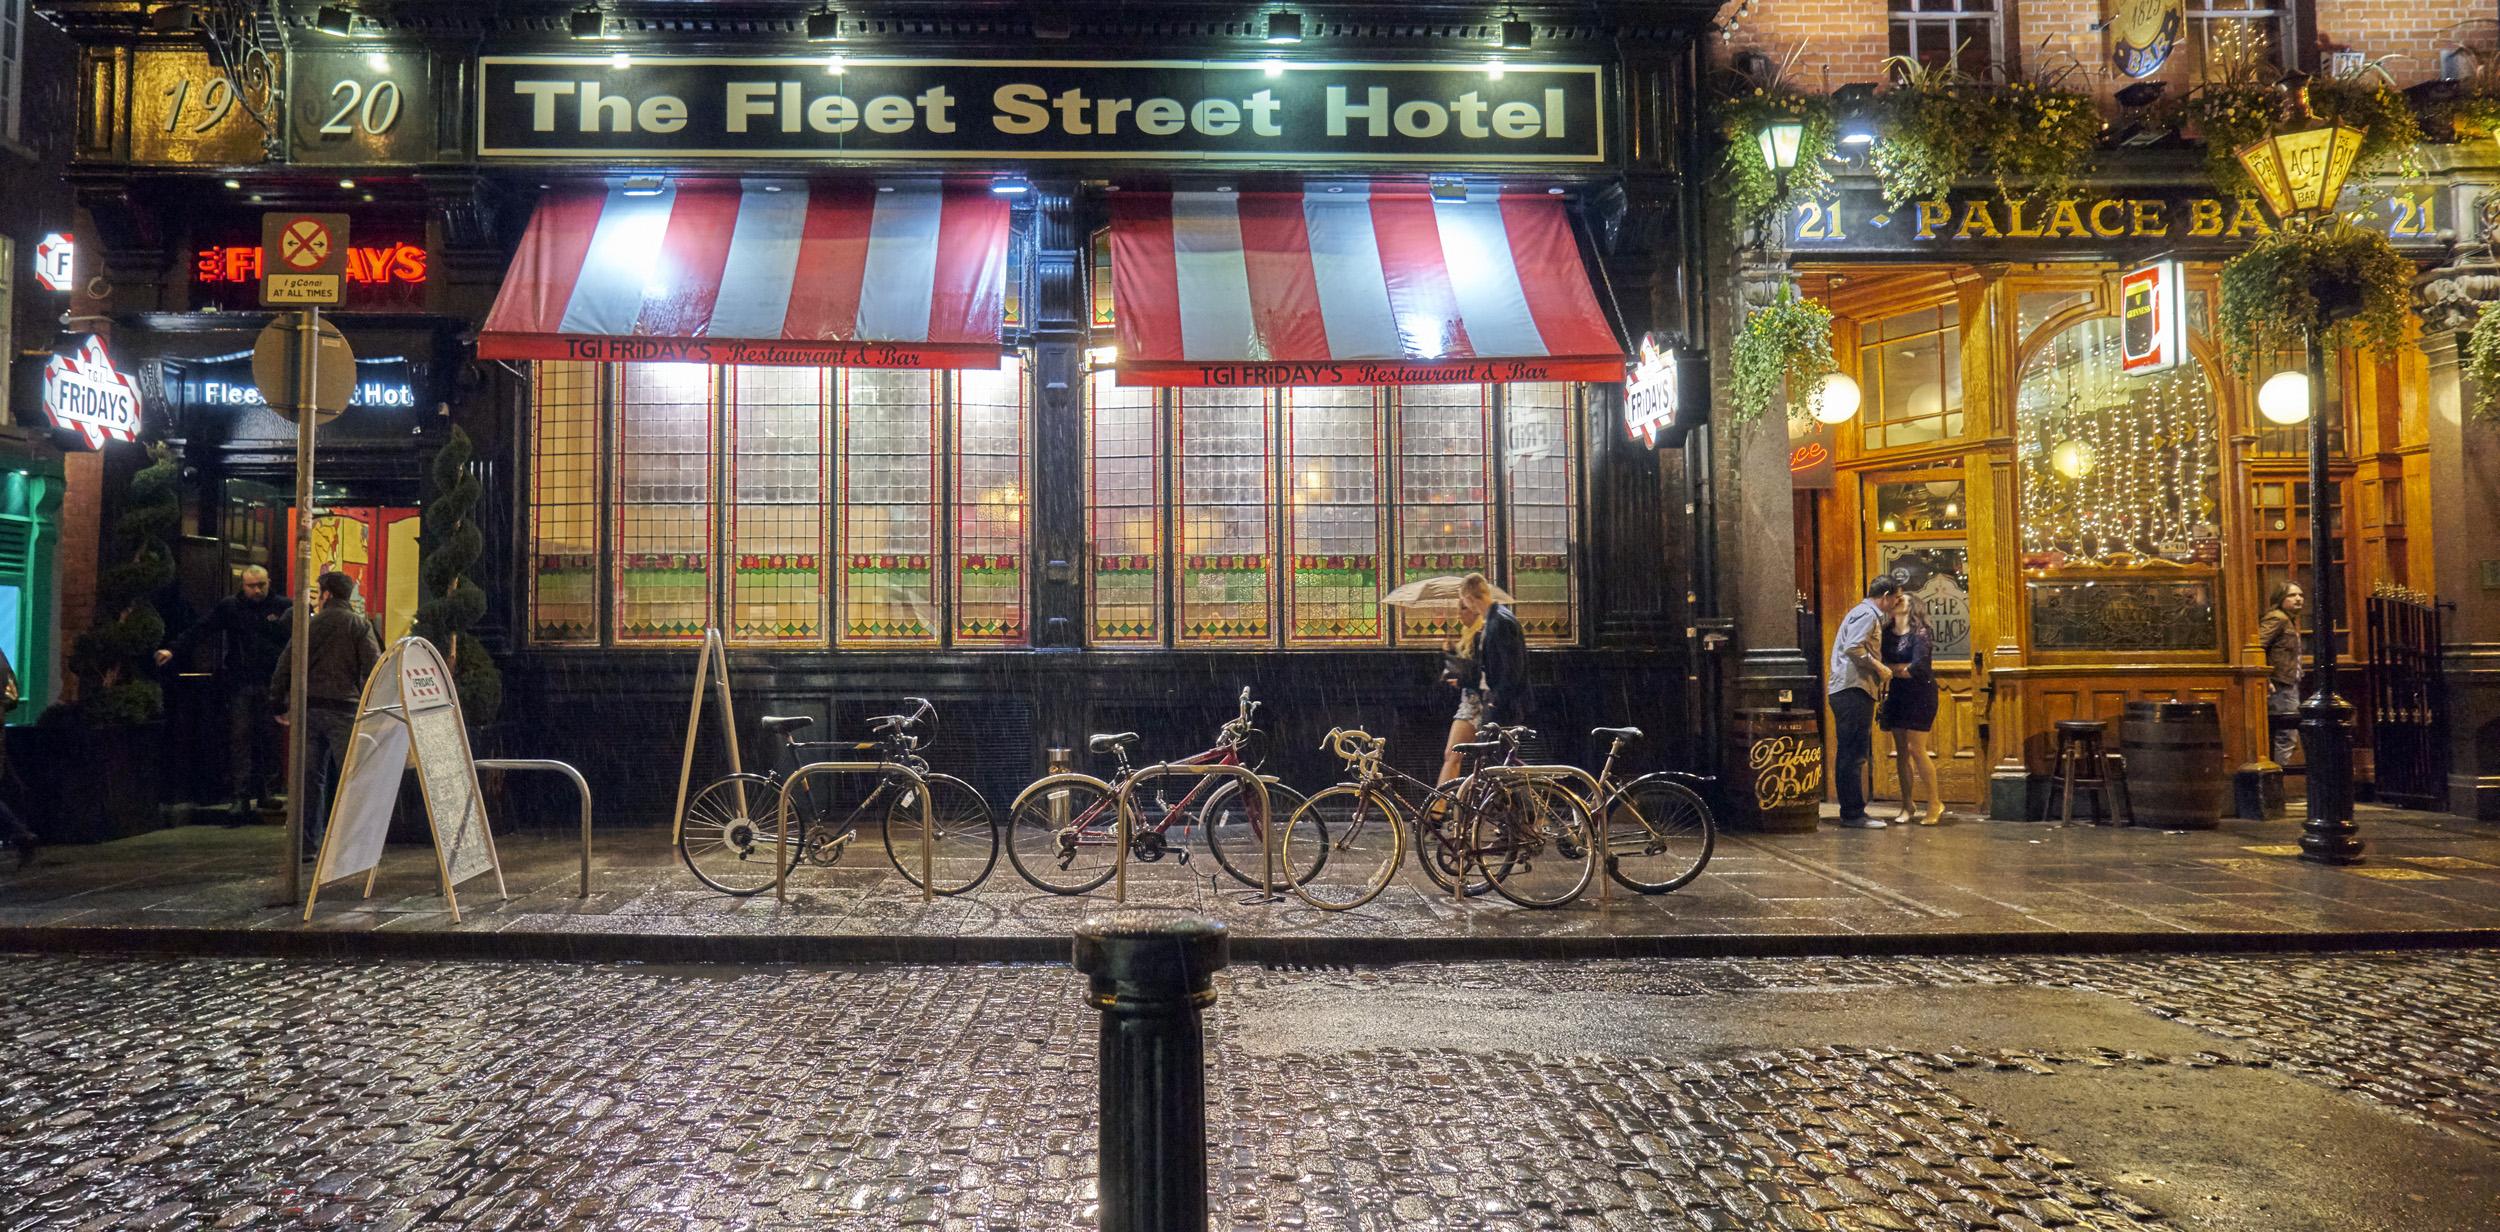 The Fleet Street Hotel # 2